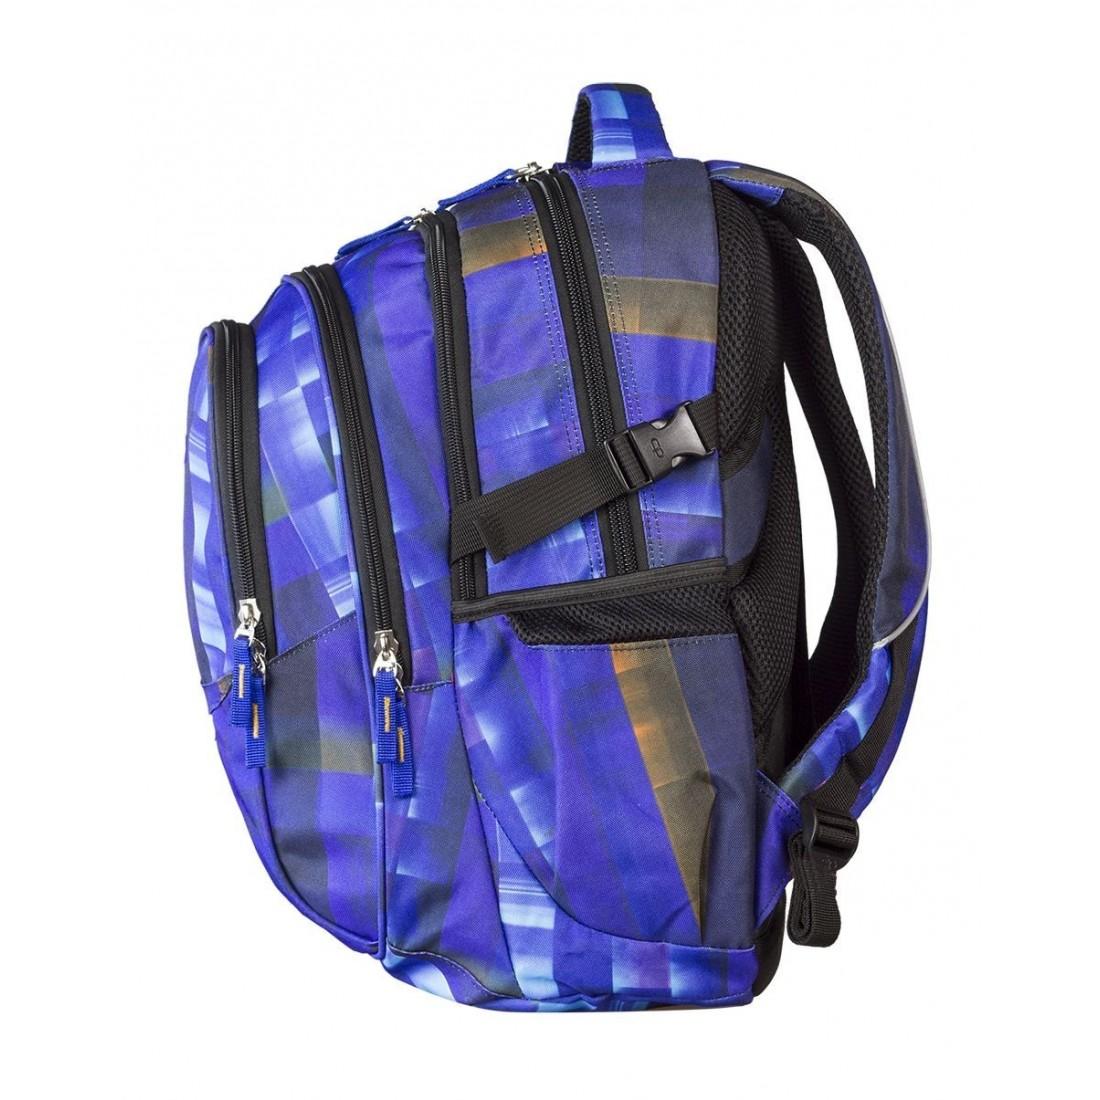 Plecak młodzieżowy CoolPack CP - 4 przegrody FACTOR DUSK 443 - plecak-tornister.pl